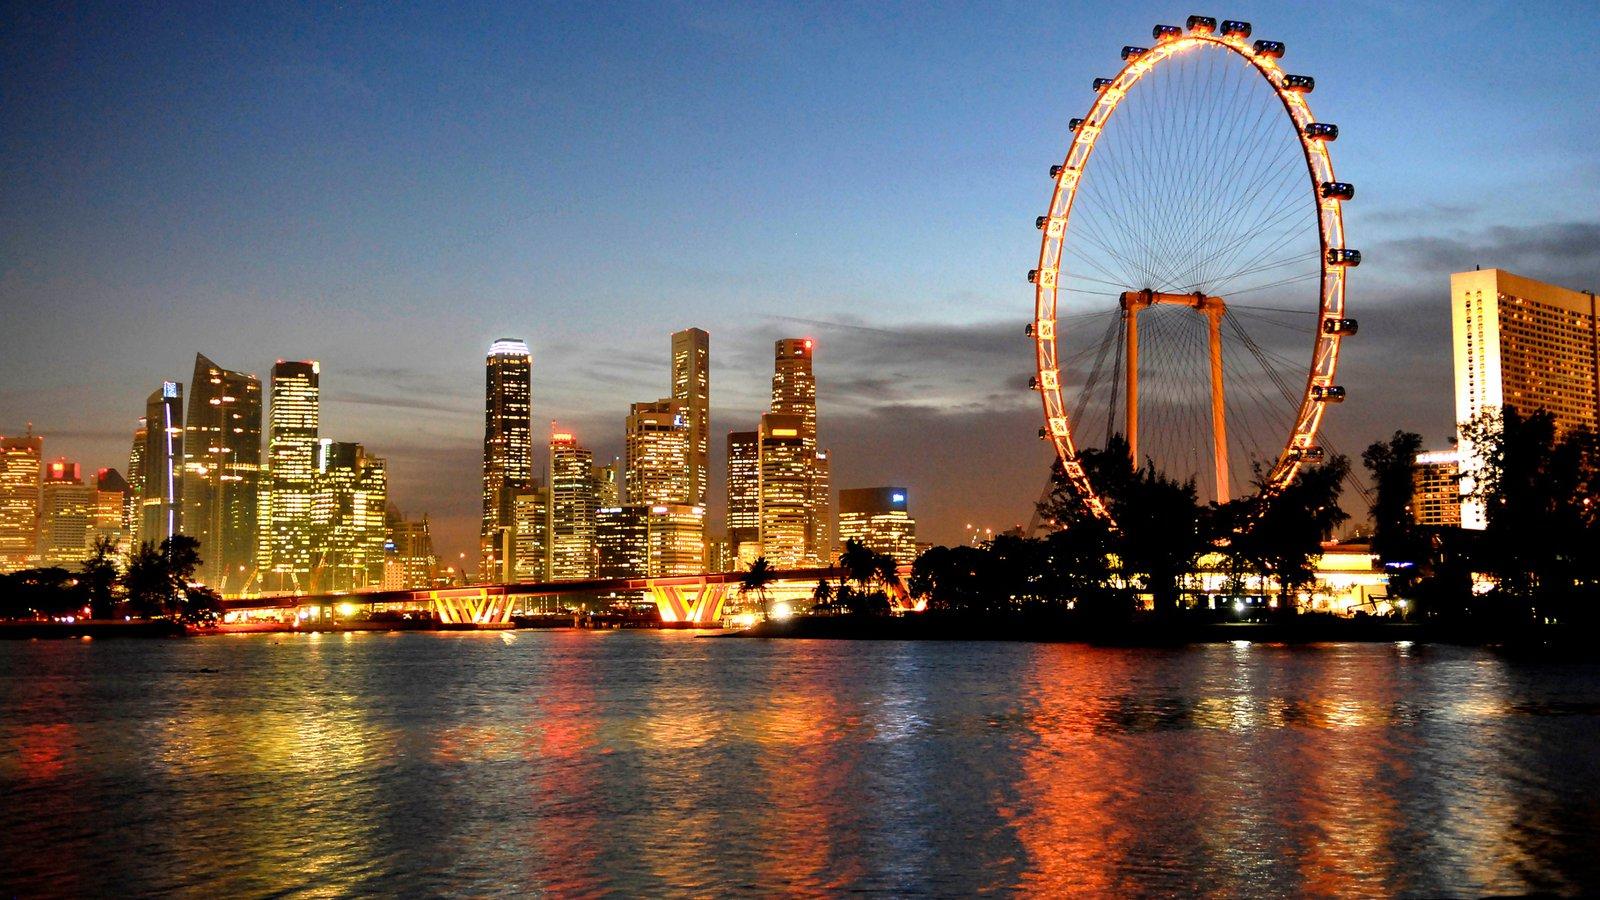 Rueda de la fortuna, Singapore Flyer, Singapur